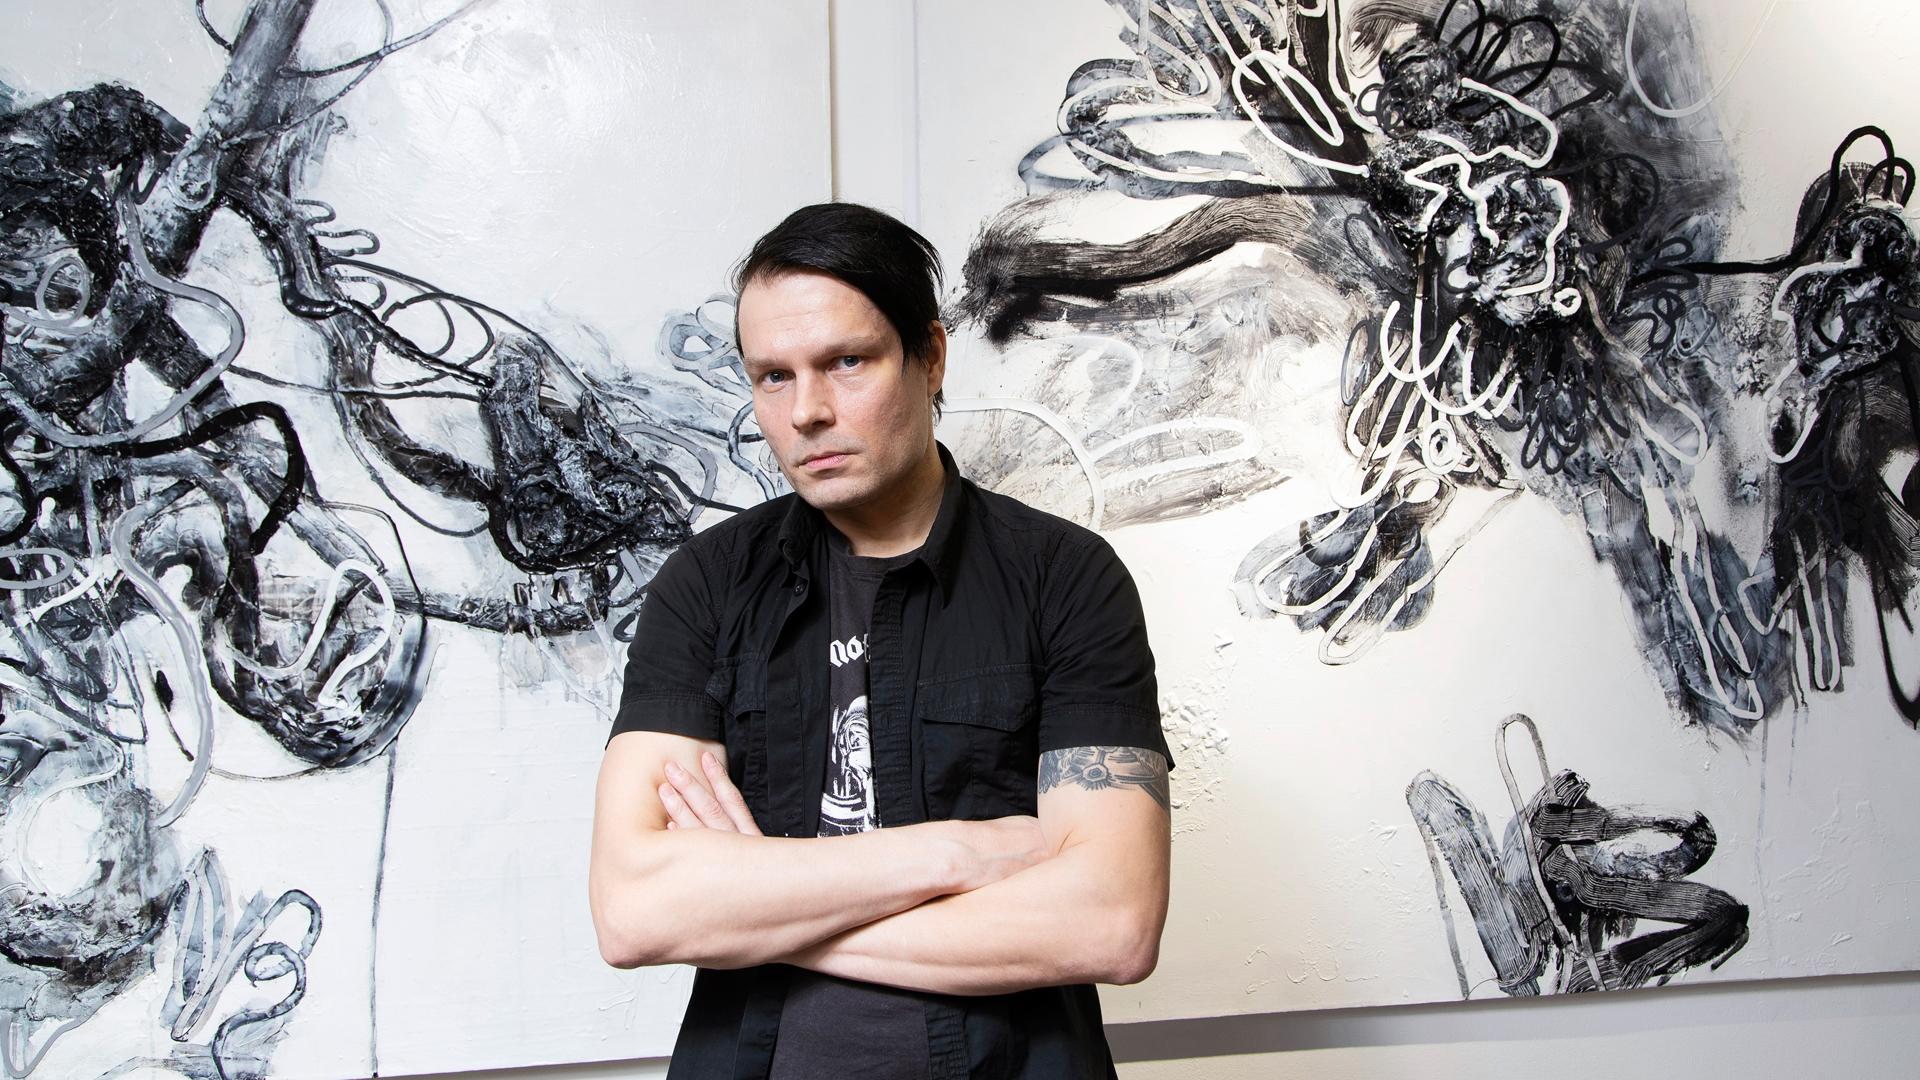 Sami Makkonen